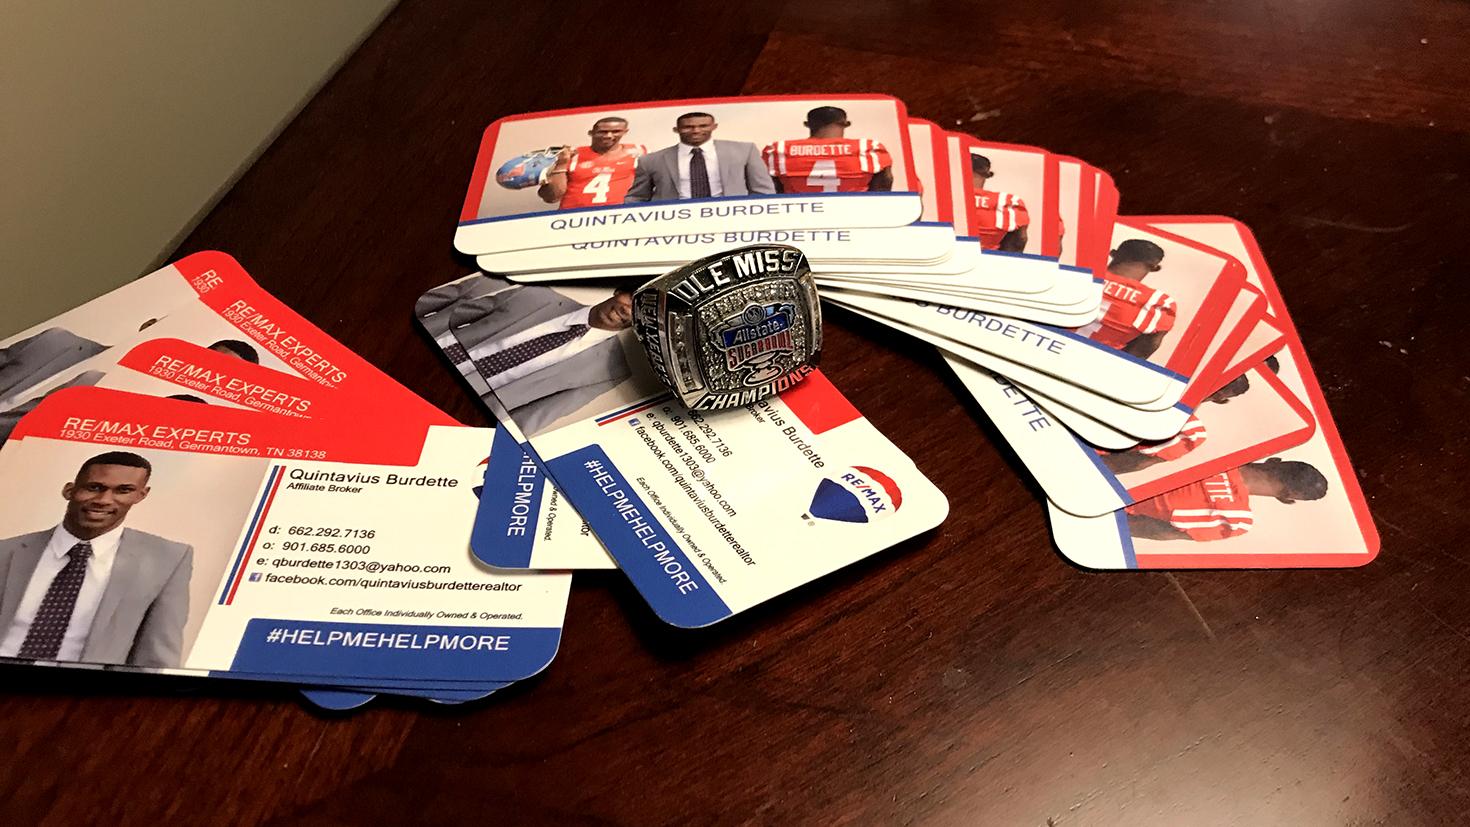 Quintavius Burdette's busines cards and football ring